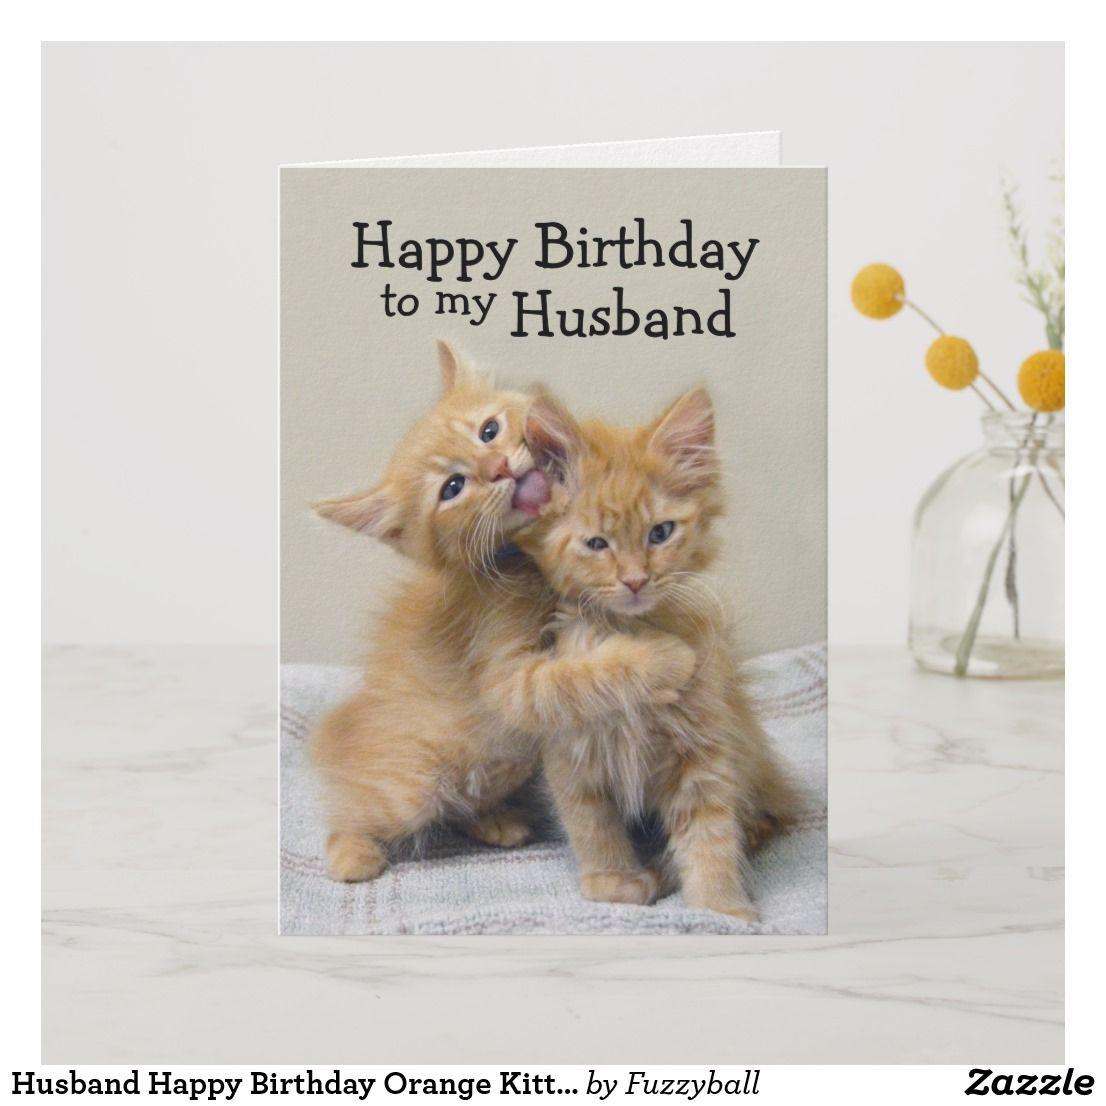 Husband Happy Birthday Orange Kittens Card Zazzle Com Orange Kittens Kittens Happy Birthday